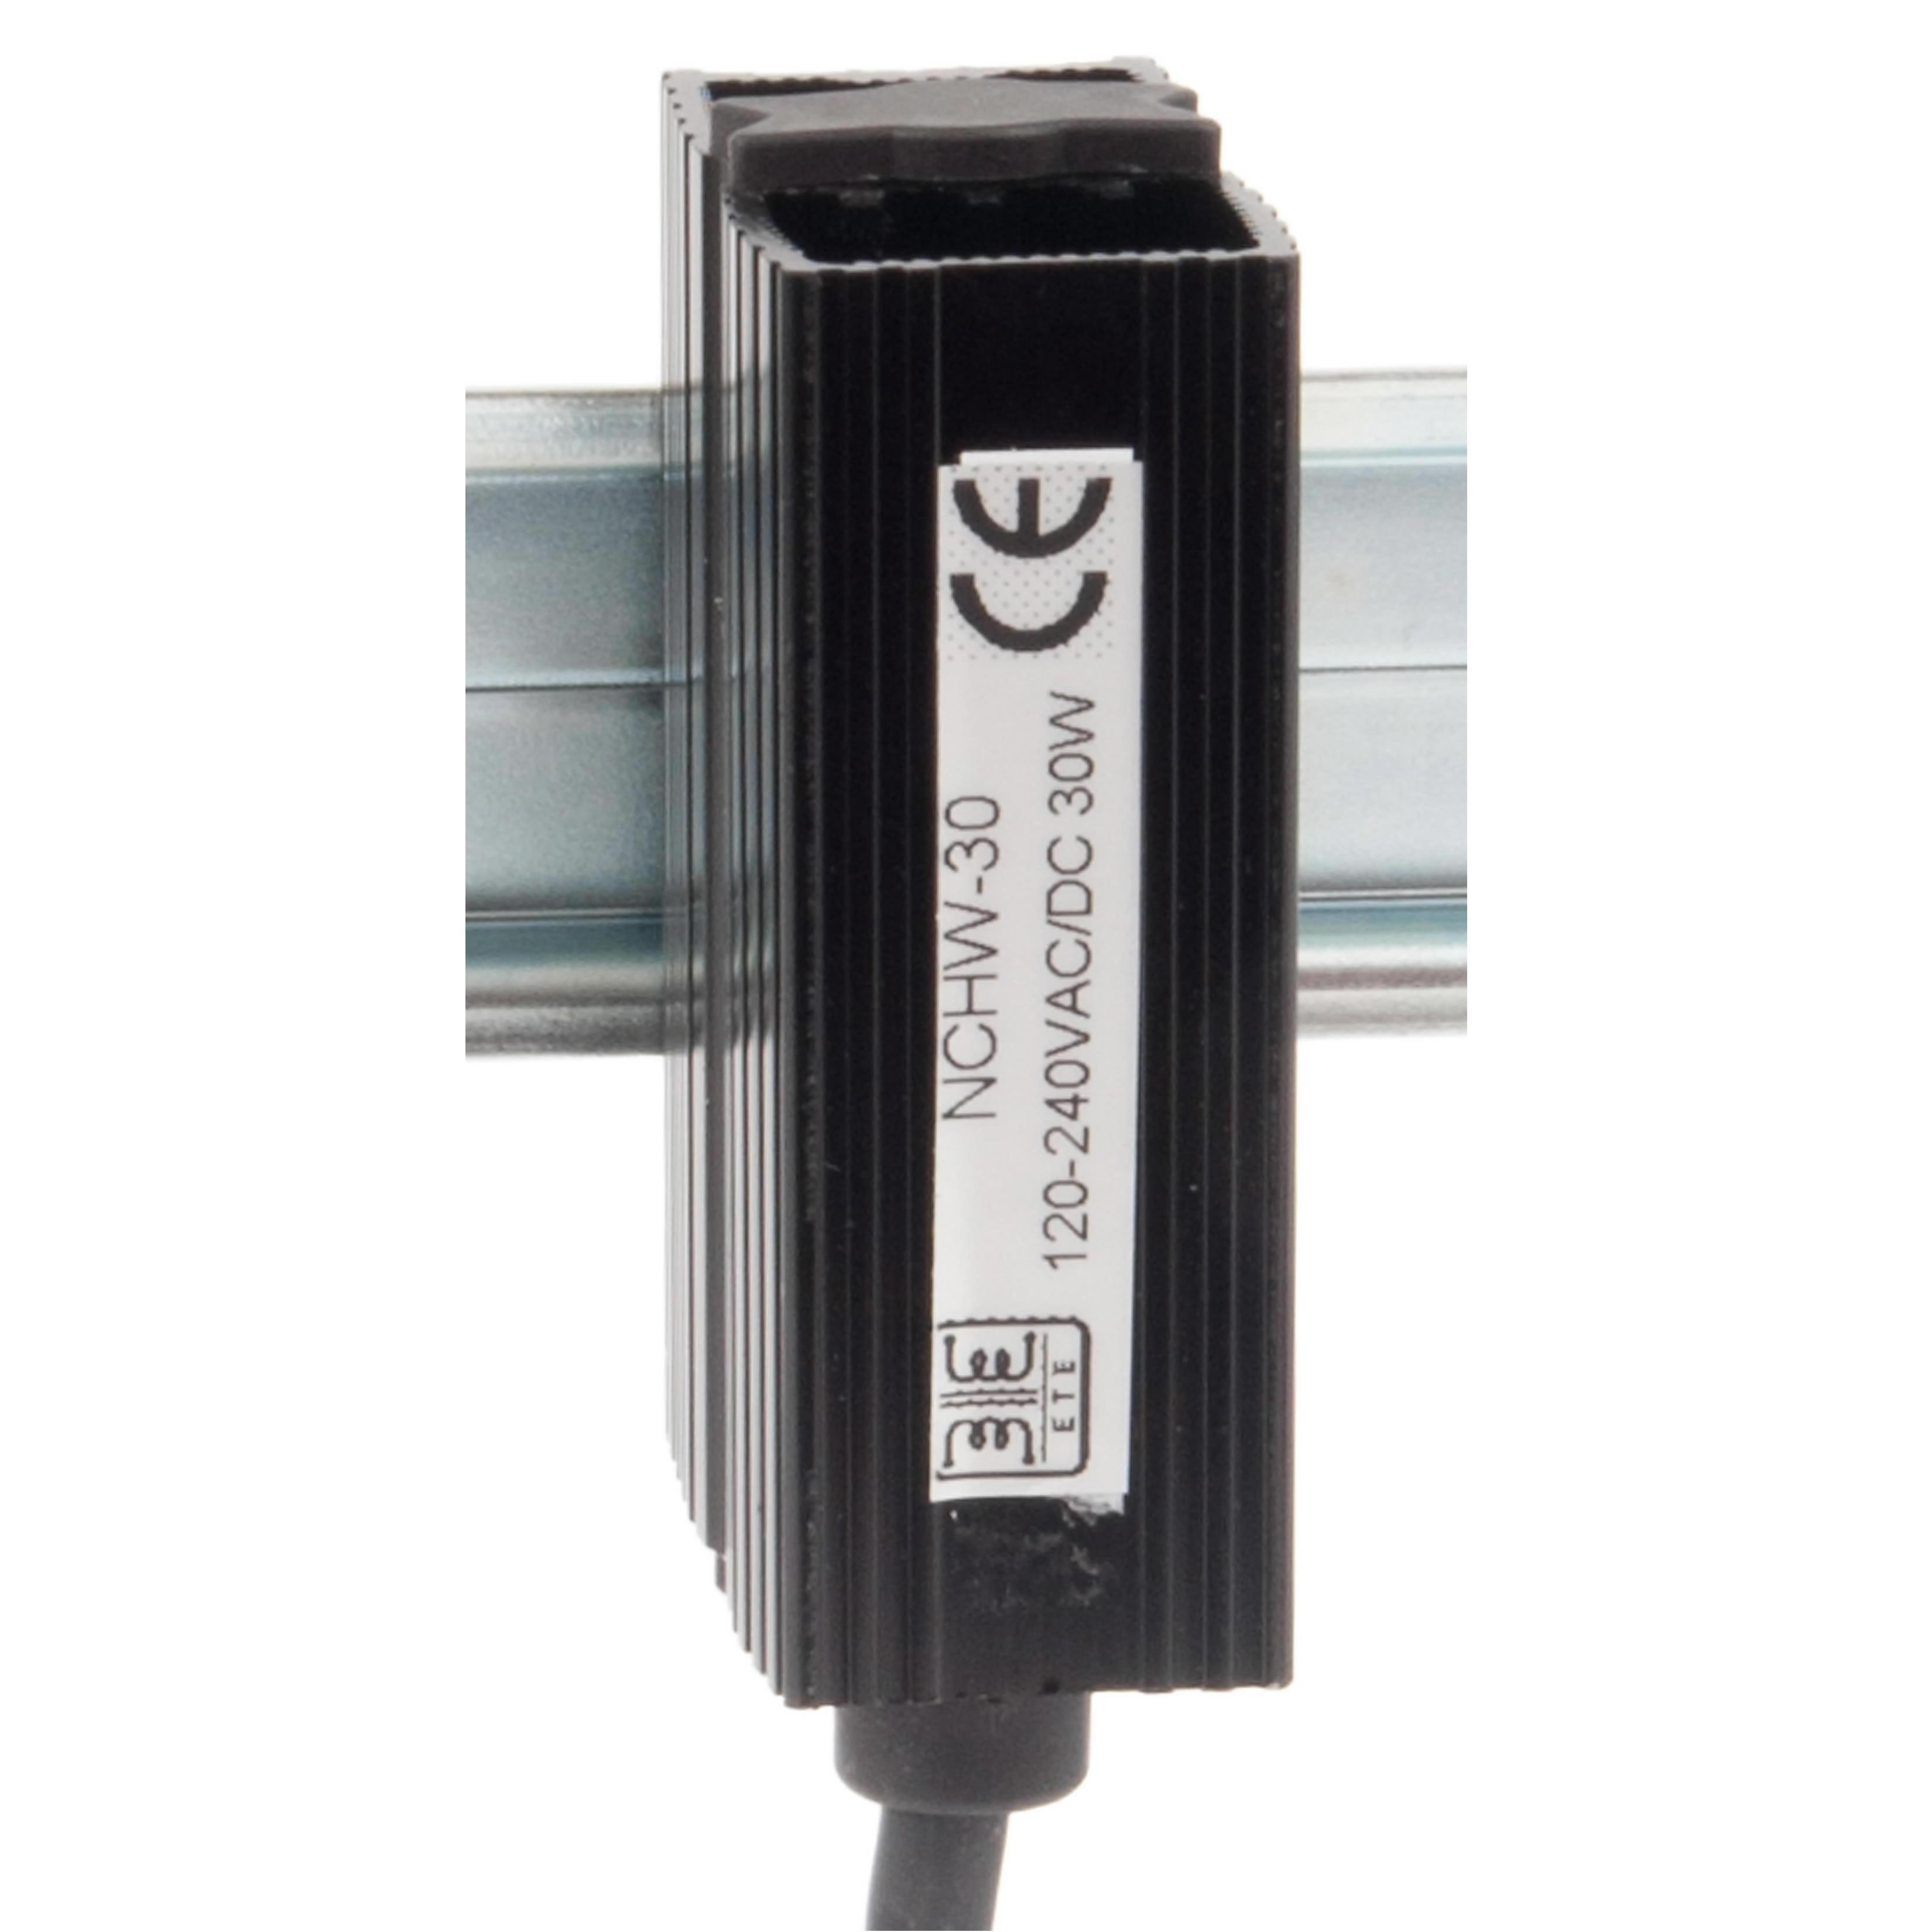 Nchw 110 250v Ac Dc Anti Condensation Heater 10 Watt